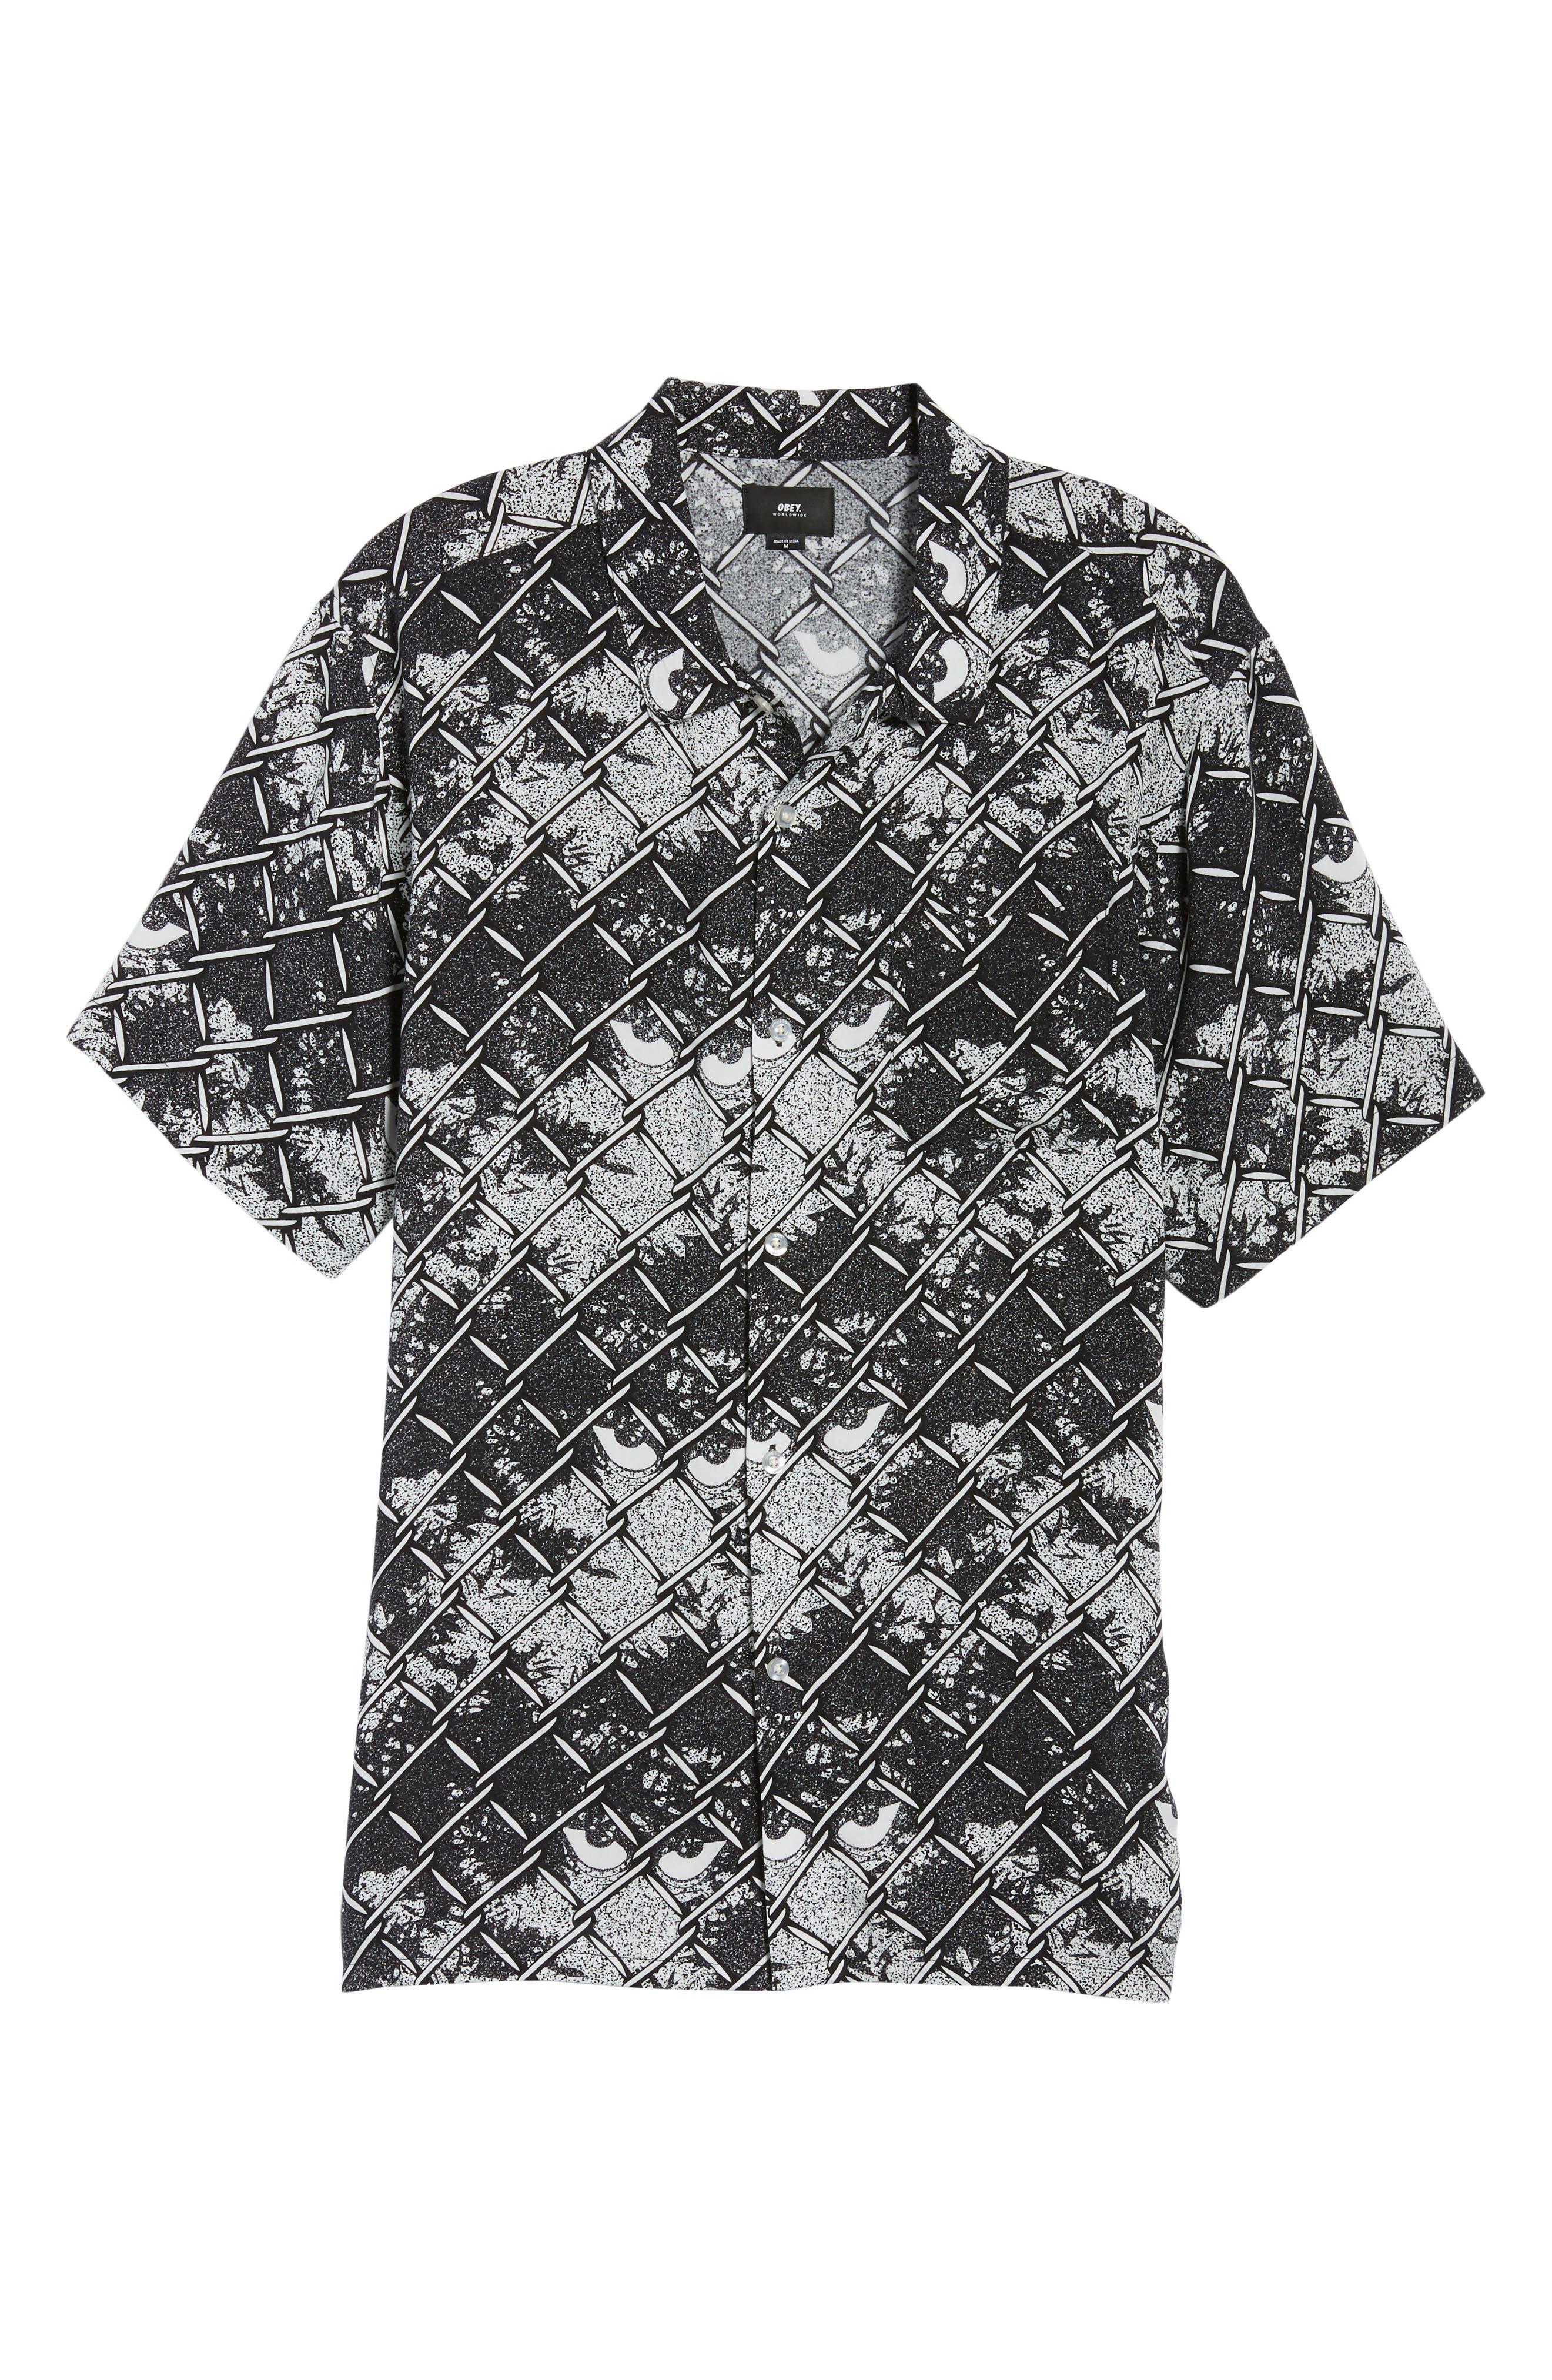 Gatekeeper Short Sleeve Shirt,                             Alternate thumbnail 6, color,                             Black Multi